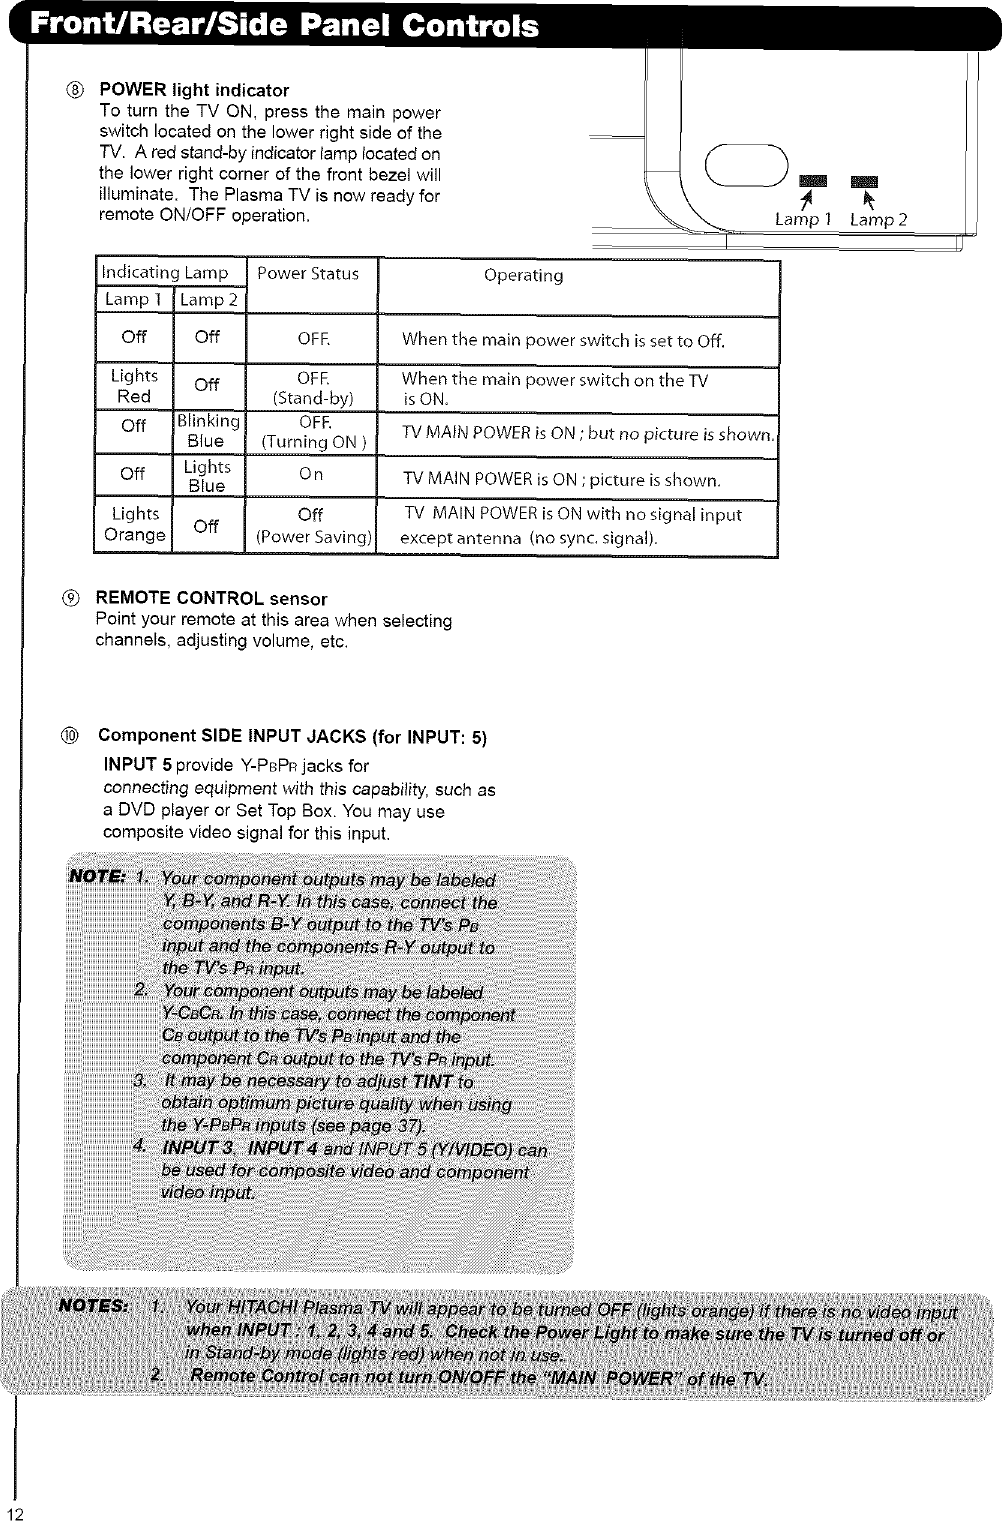 Hitachi 42HDS69 User Manual PLASMA TELEVISION Manuals And Guides